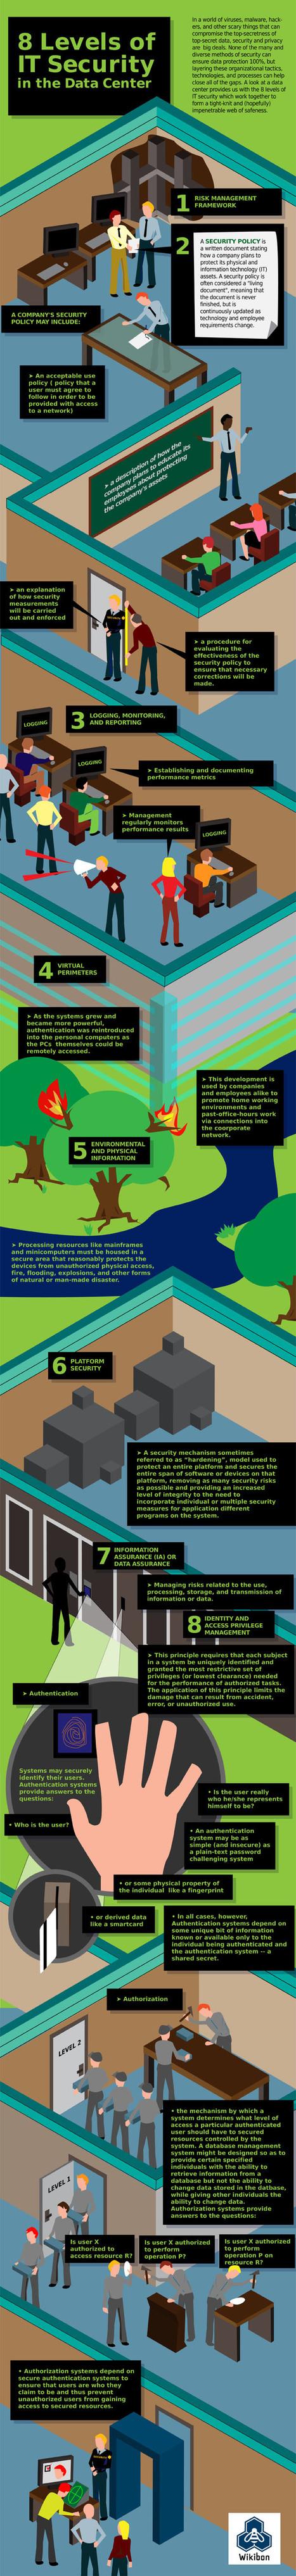 8 Levels of IT Security [Infographic] | #Security #InfoSec #CyberSecurity #Sécurité #CyberSécurité #CyberDefence & #DevOps #DevSecOps | Scoop.it